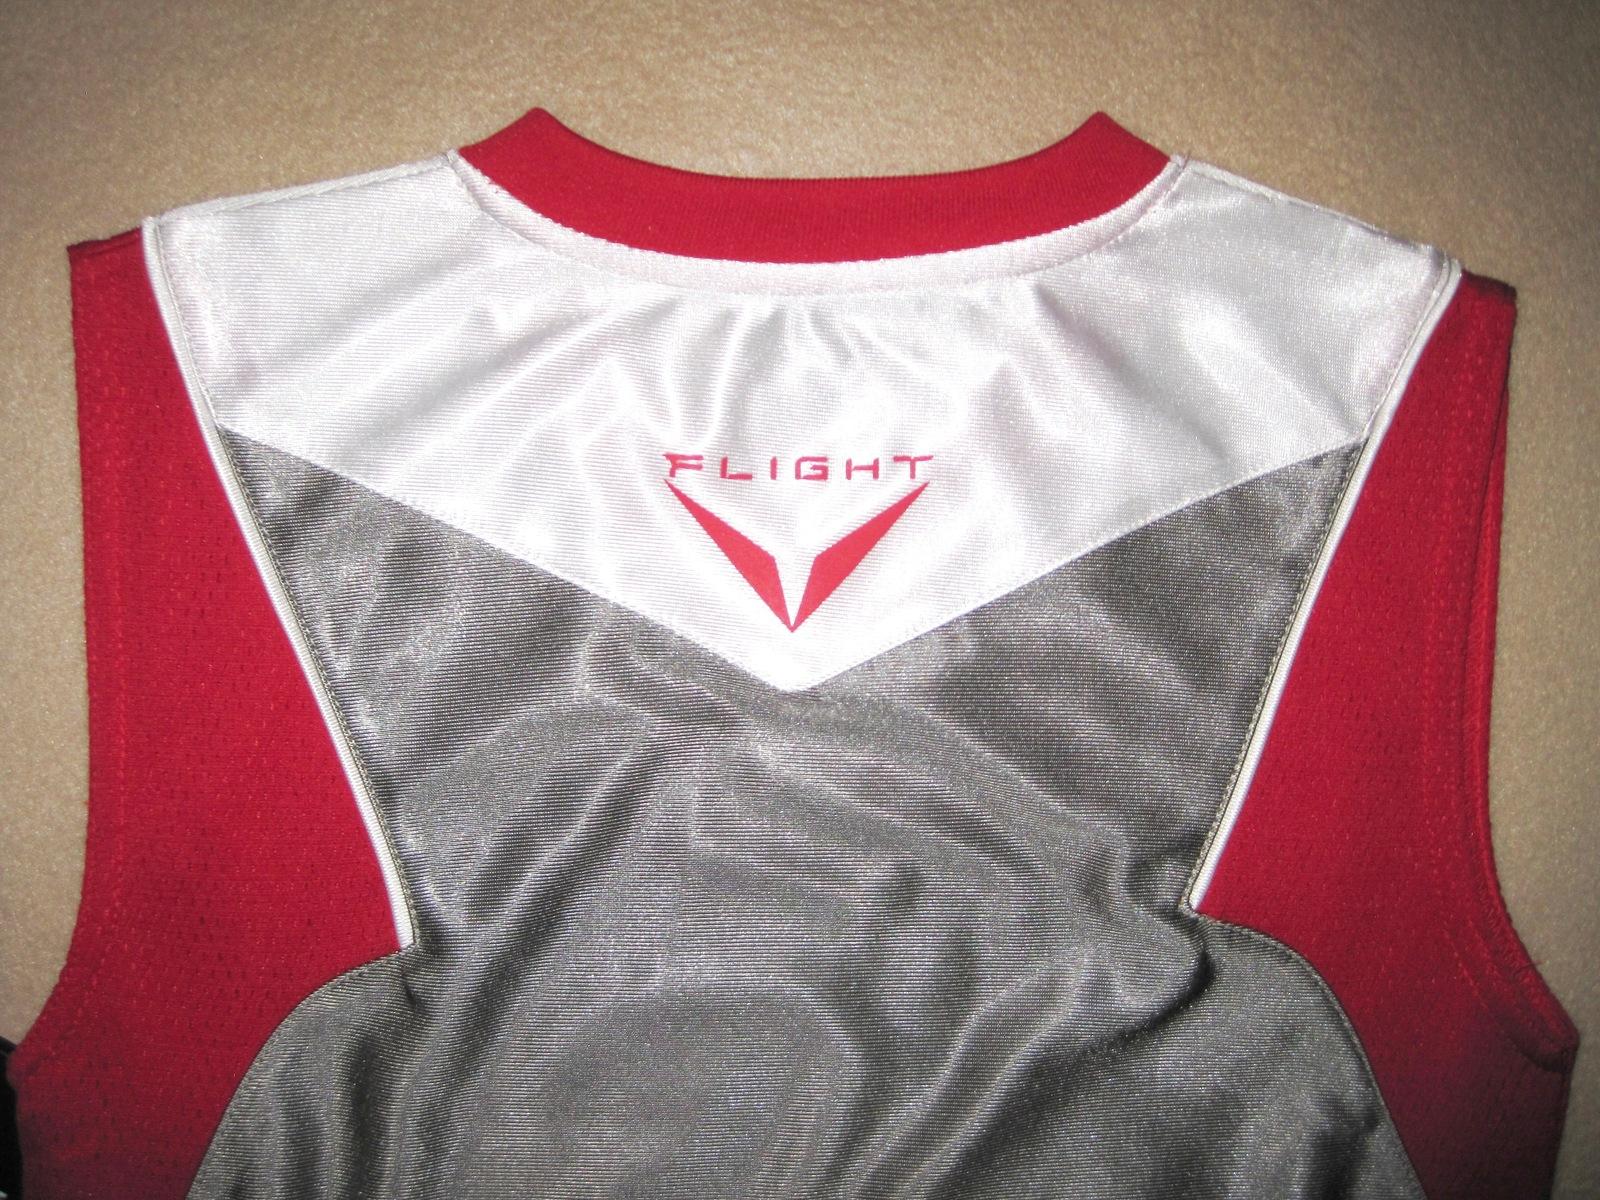 BOYS 7 - Nike - Flight Grey-Red-White BASKETBALL SPORTS JERSEY image 5